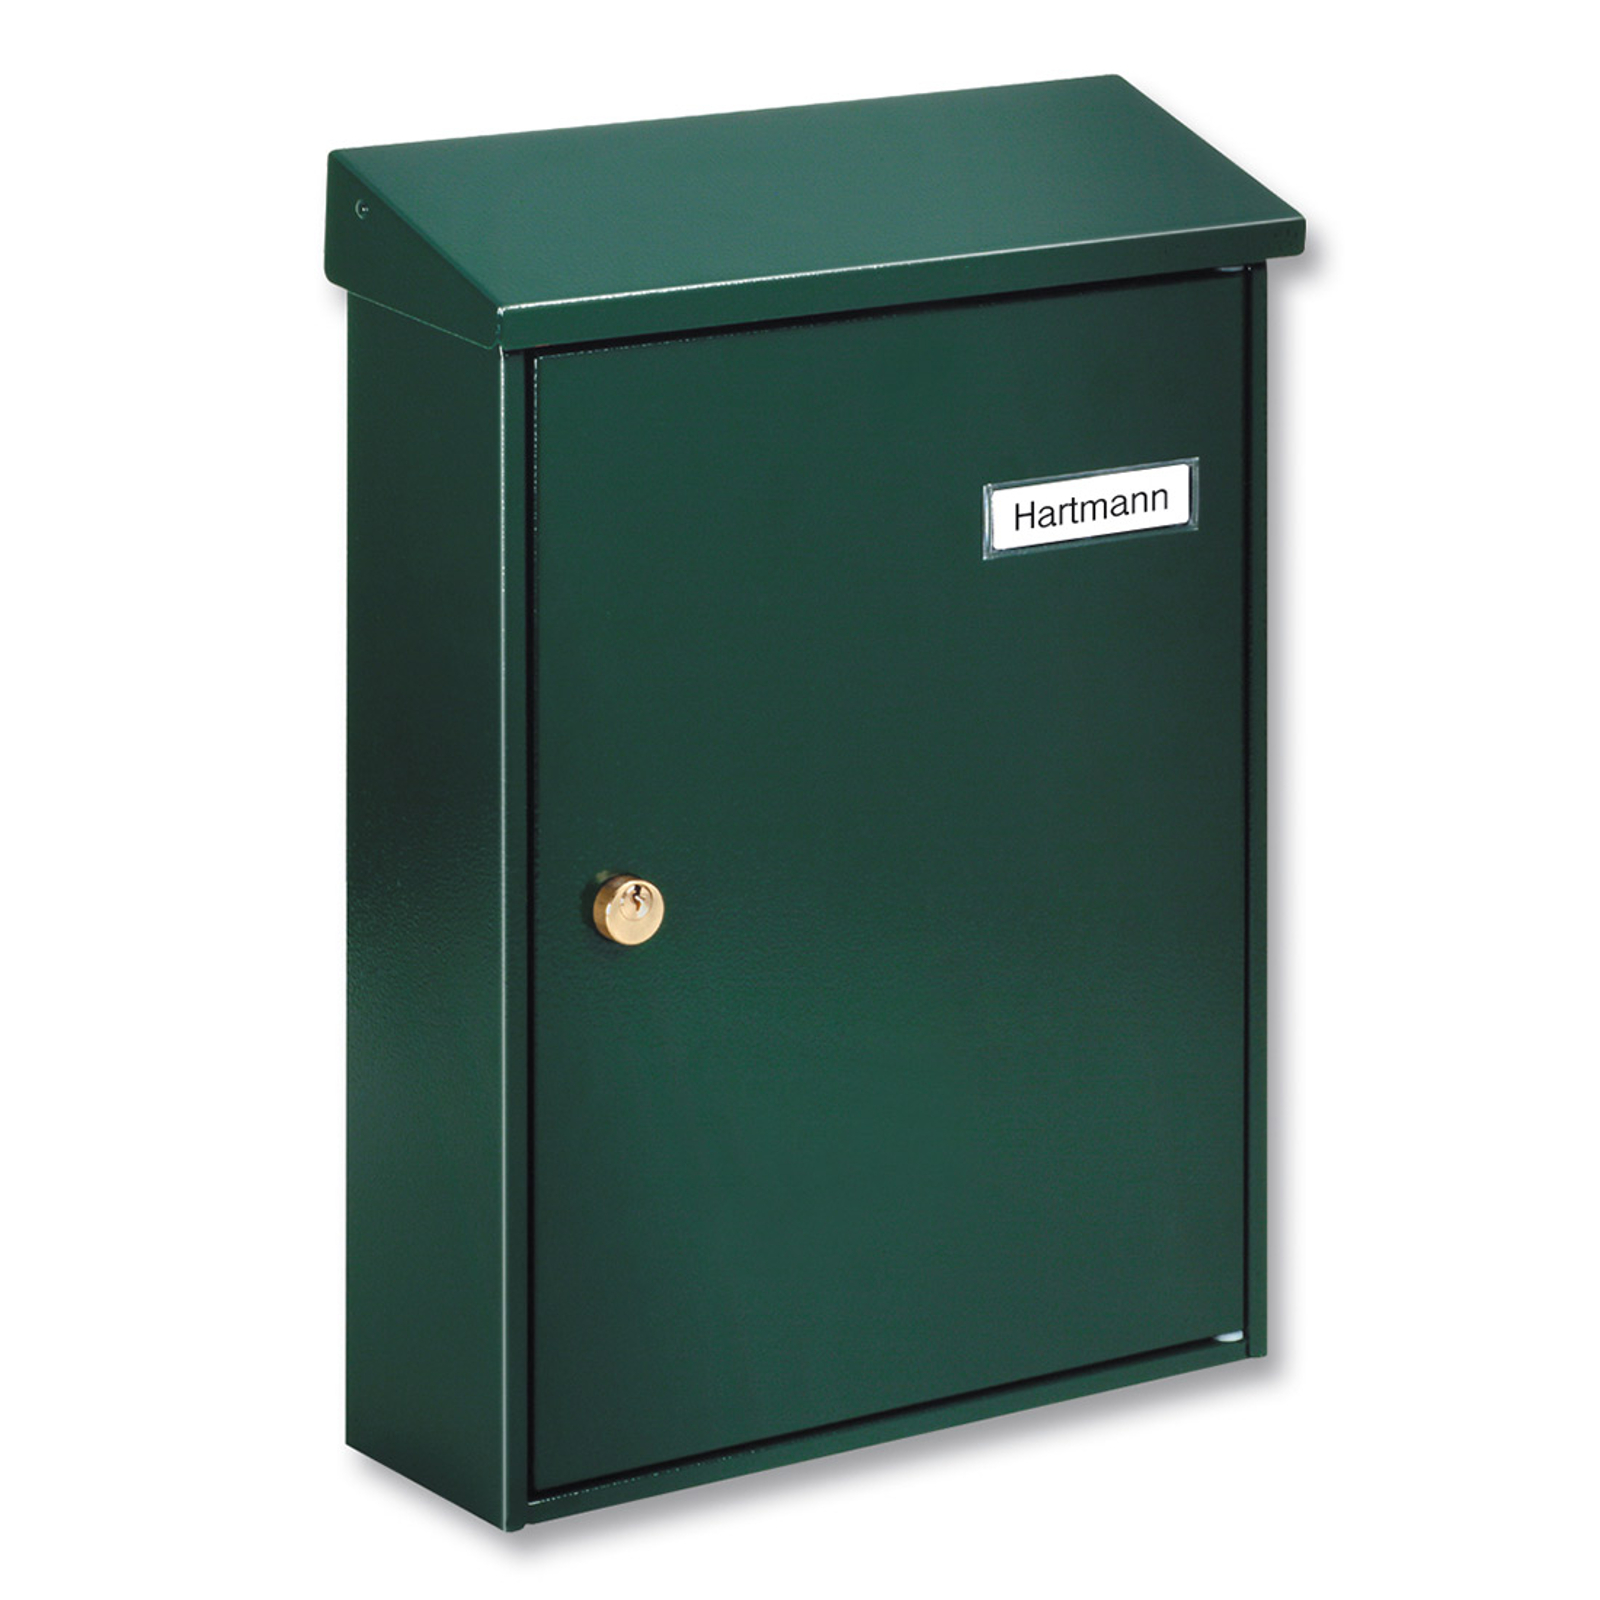 Semplice cassetta postale Letter 5832, verde